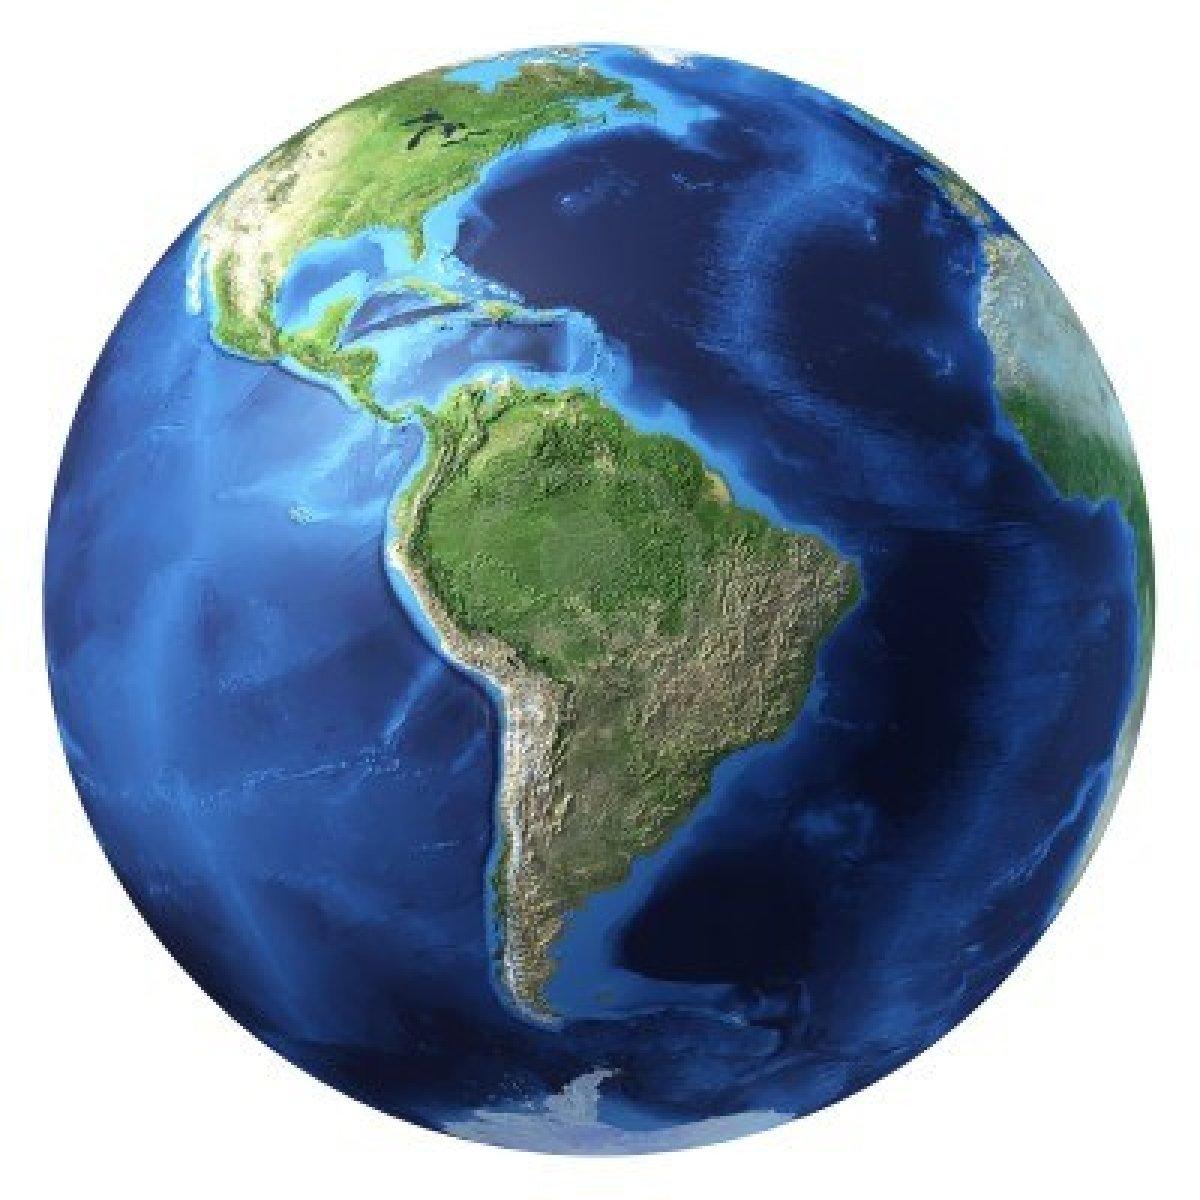 imagen sobre tierra: